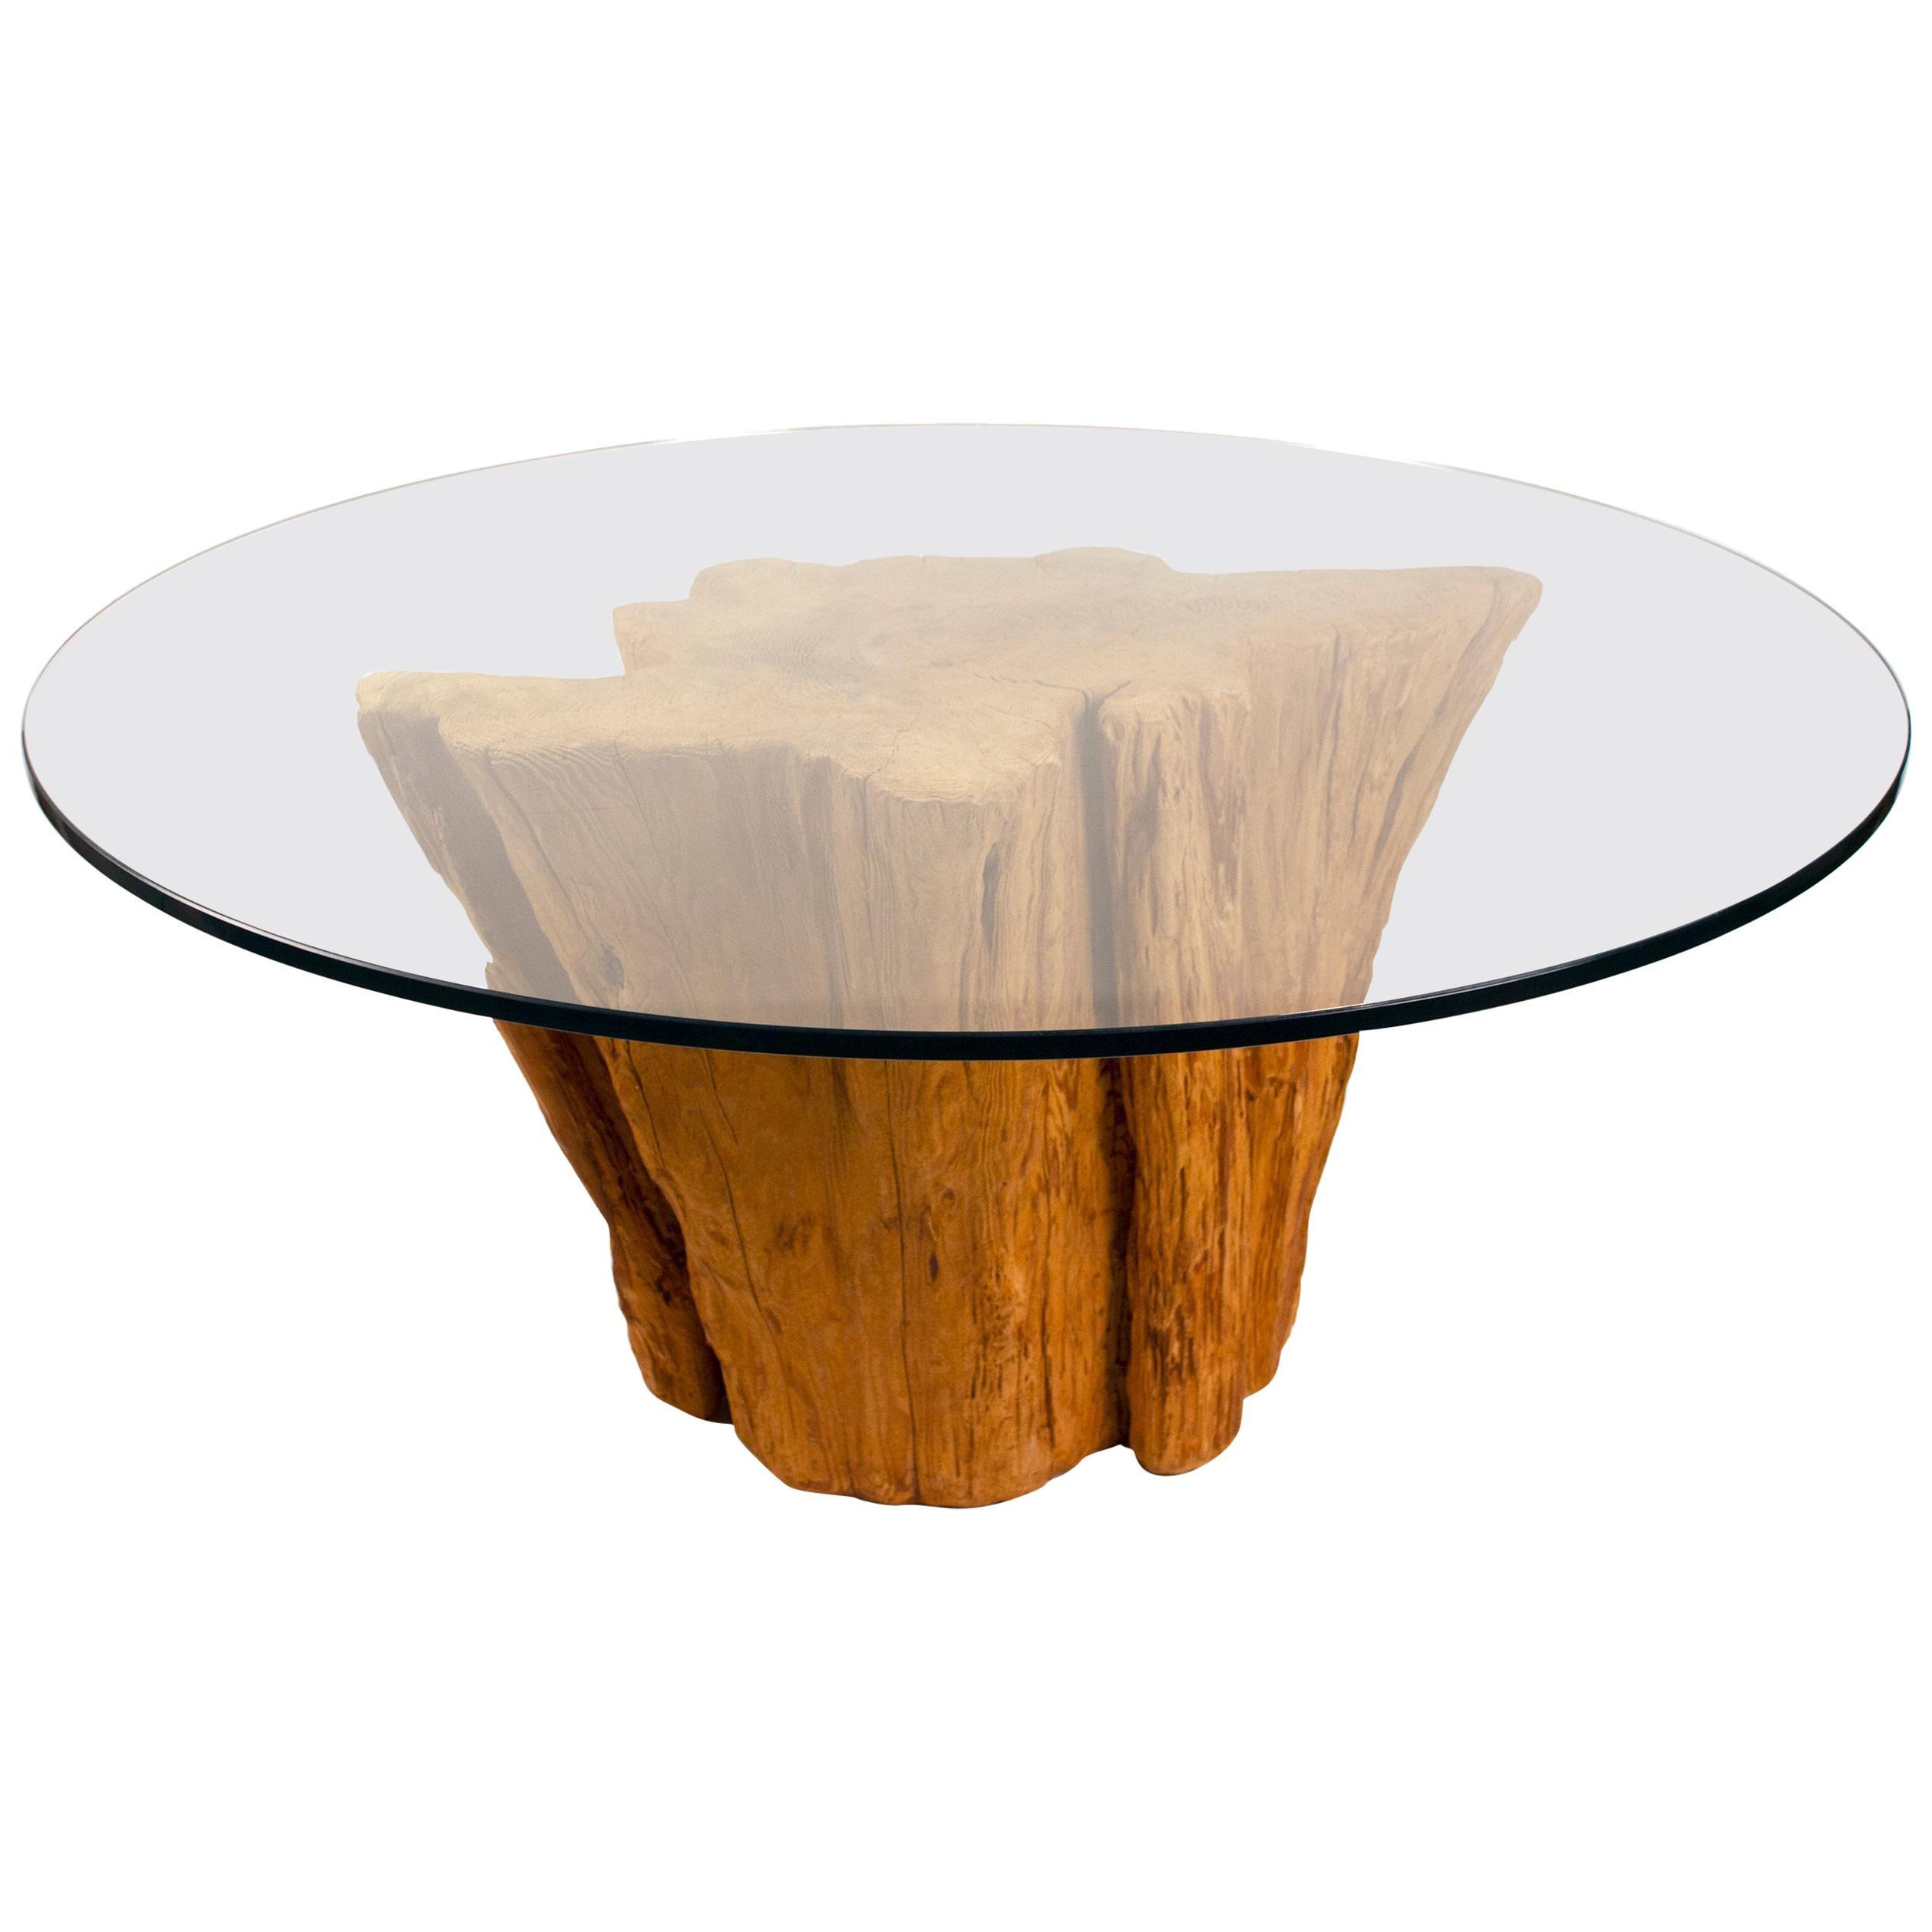 Modern Cypress Tree Trunk Dining Table 1970s Sandblasted Organic Freeform Design